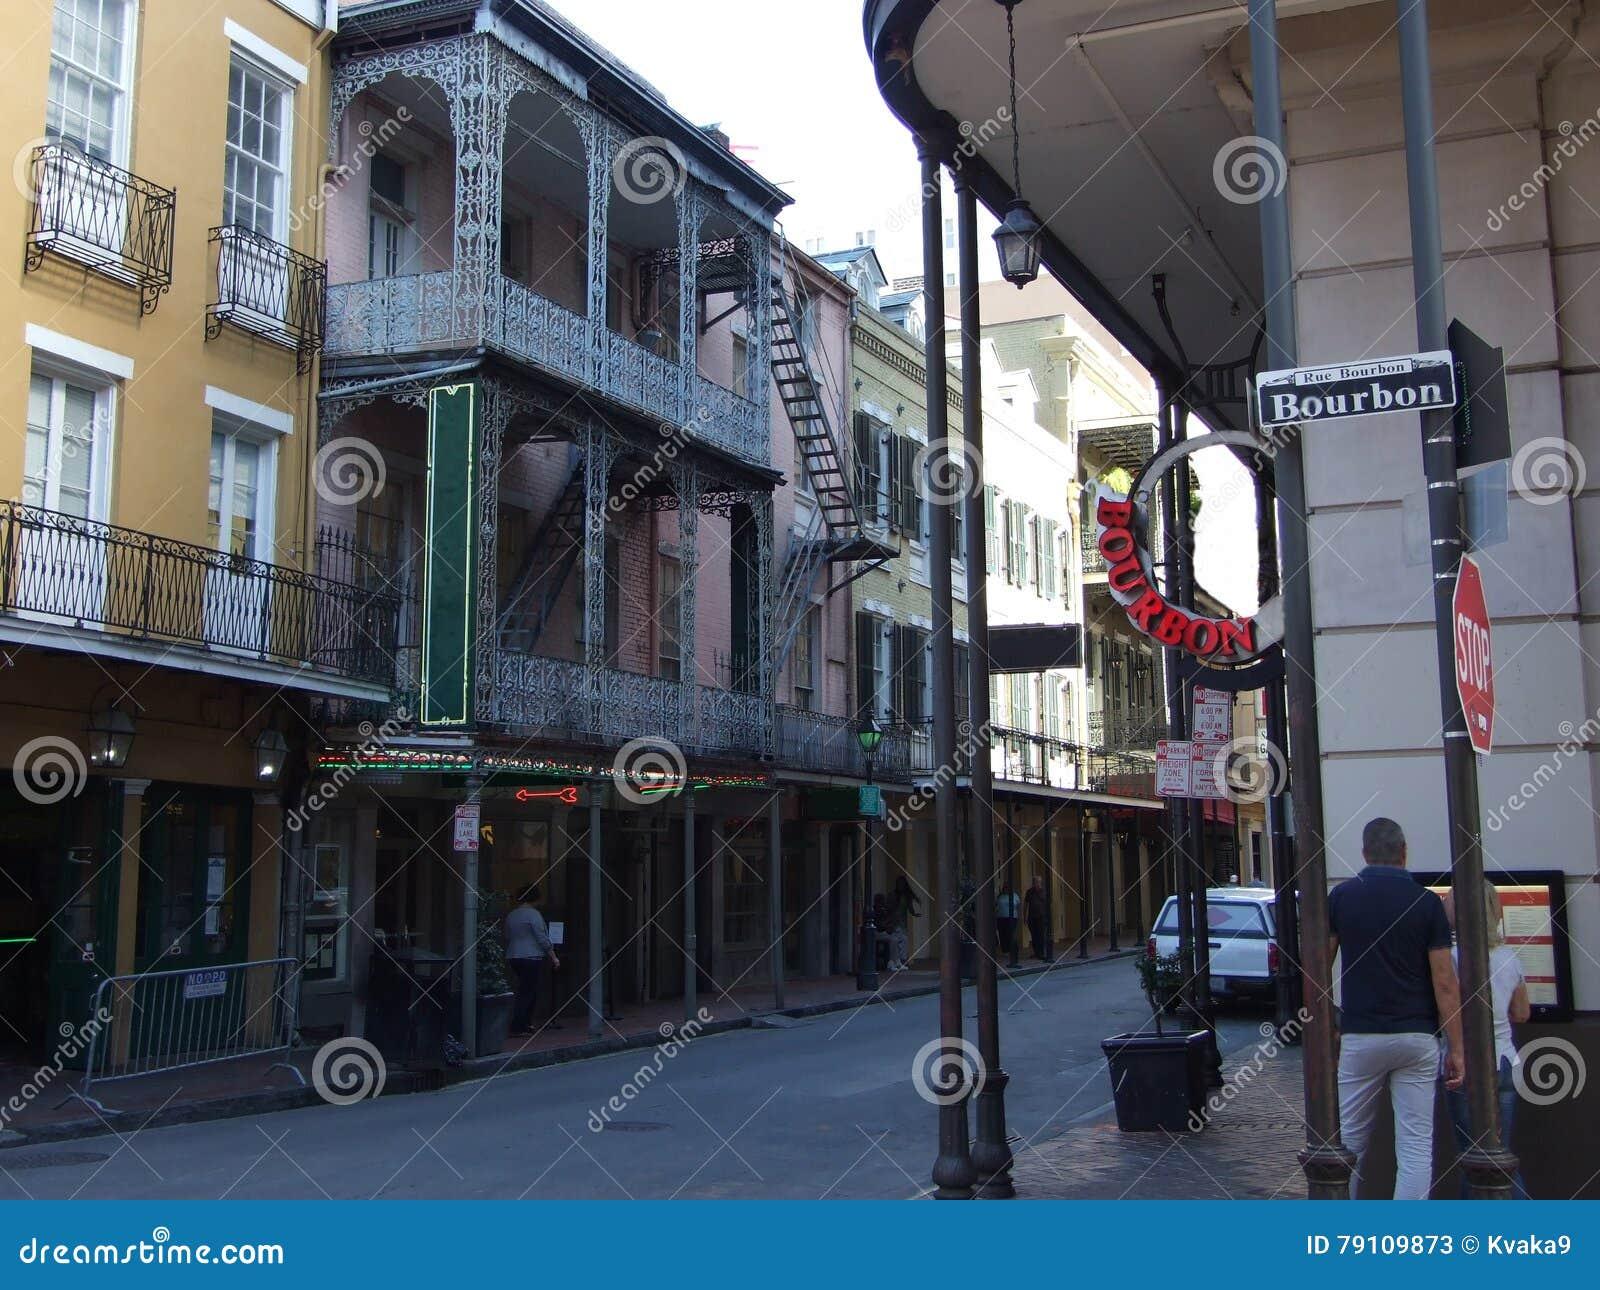 Esquina de Borbón y de la calle de Iberville - barrio francés en New Orleans